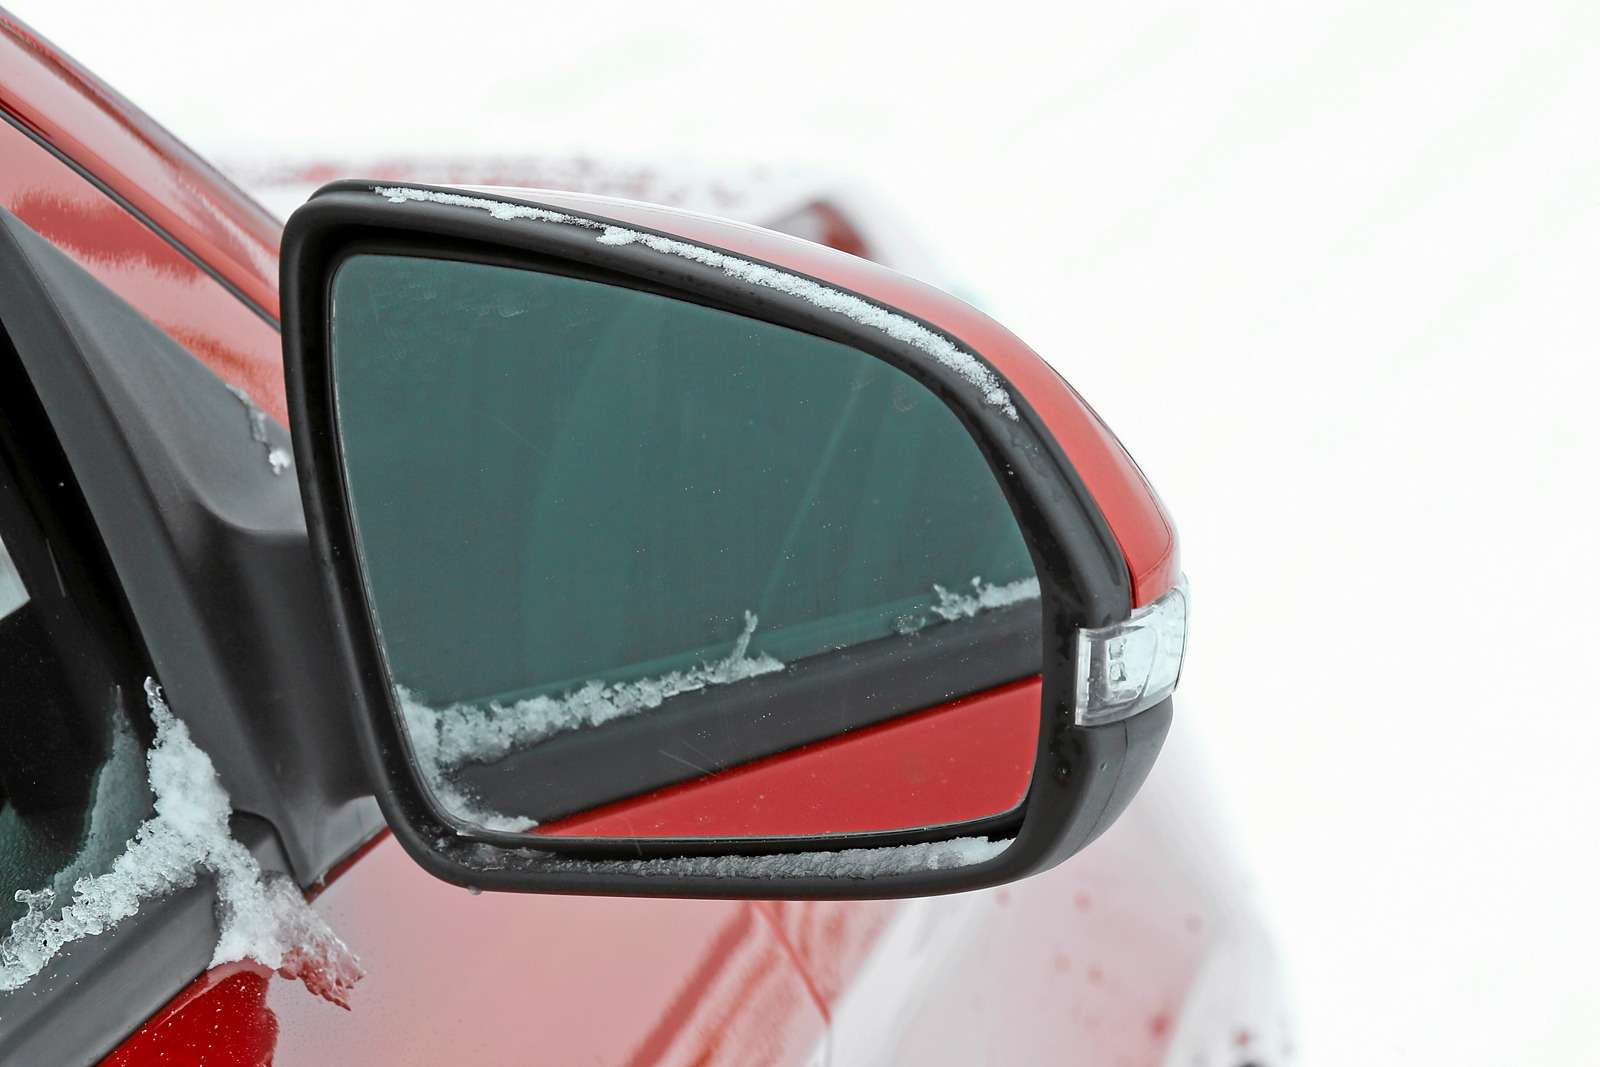 Большой зимний тест: Lada Vesta, Lada XRAY иDatsun mi-DO изпарка ЗР— фото 571436